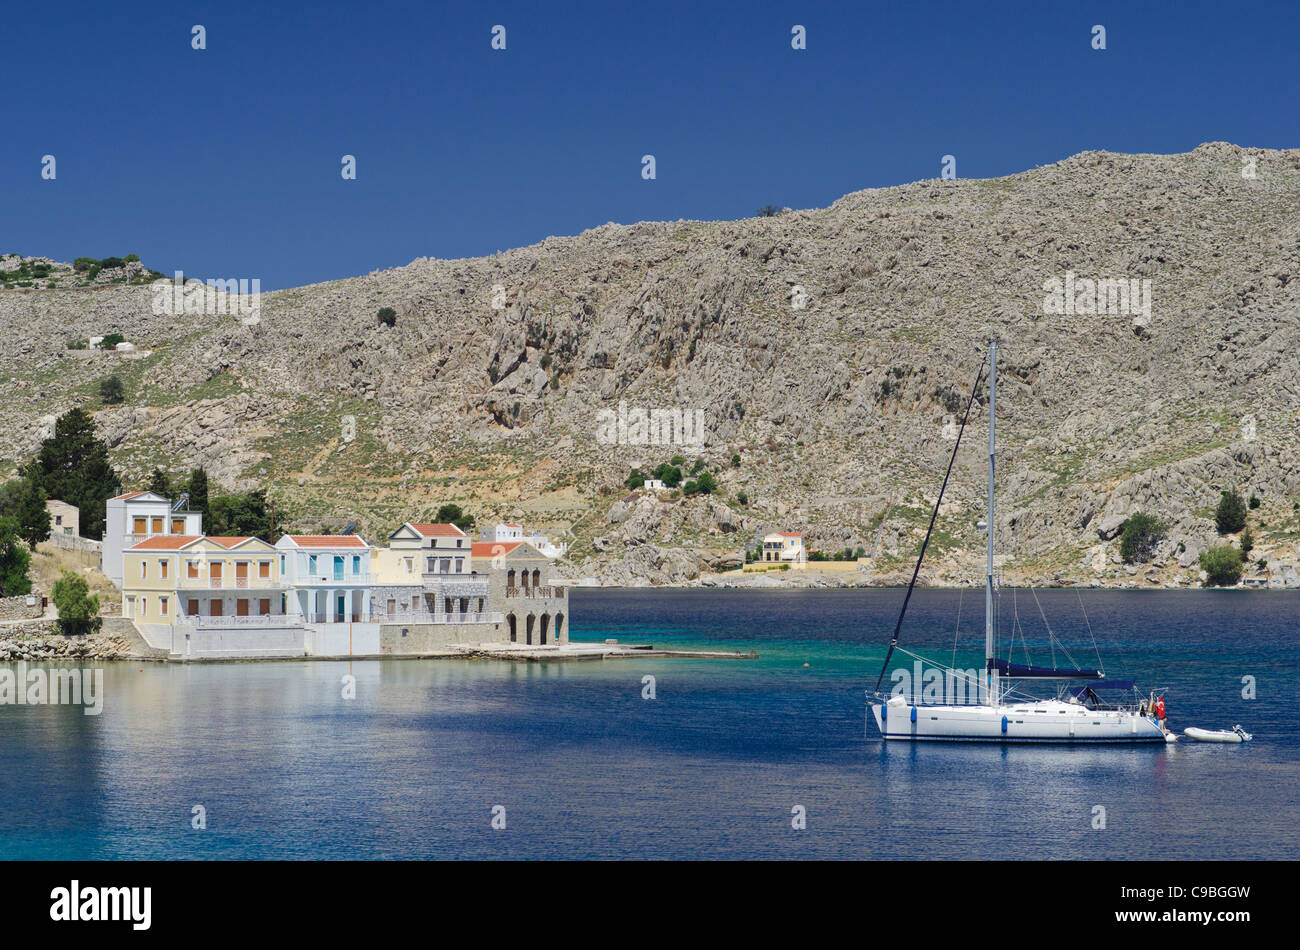 Symi Island coastal views from the road to Emborios, Greece - Stock Image